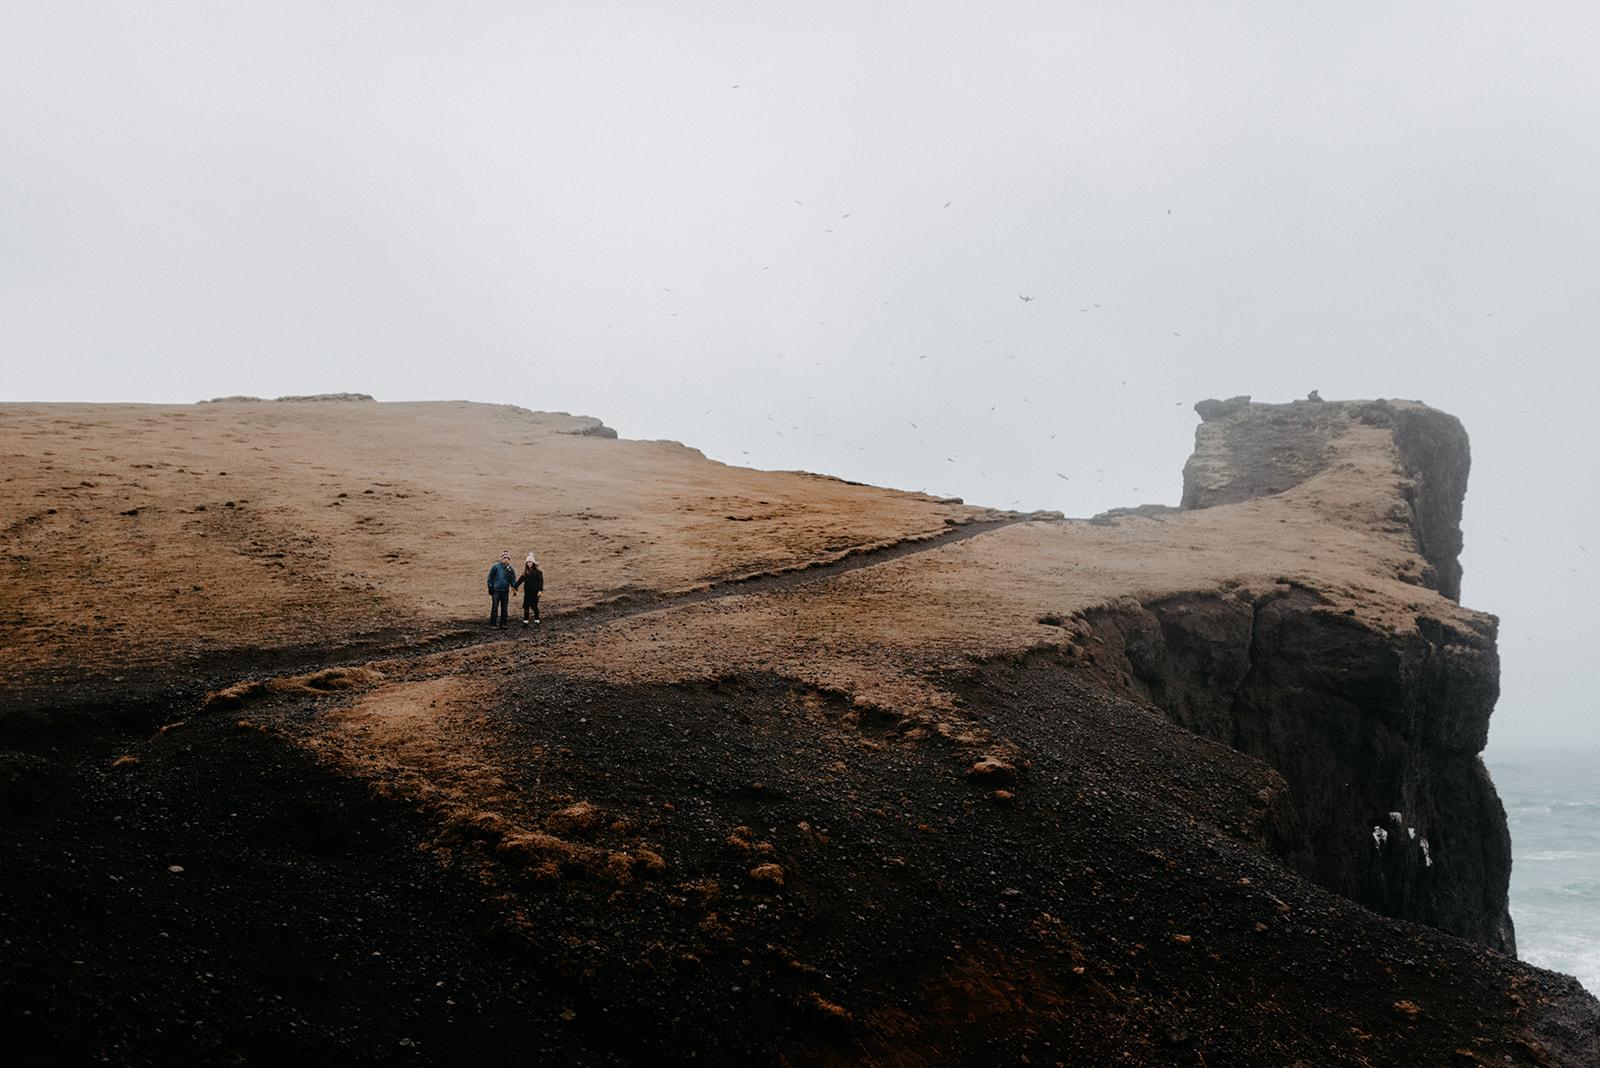 Mack & Michael - Sesja na Islandii 31 alebosco islandia mm 31